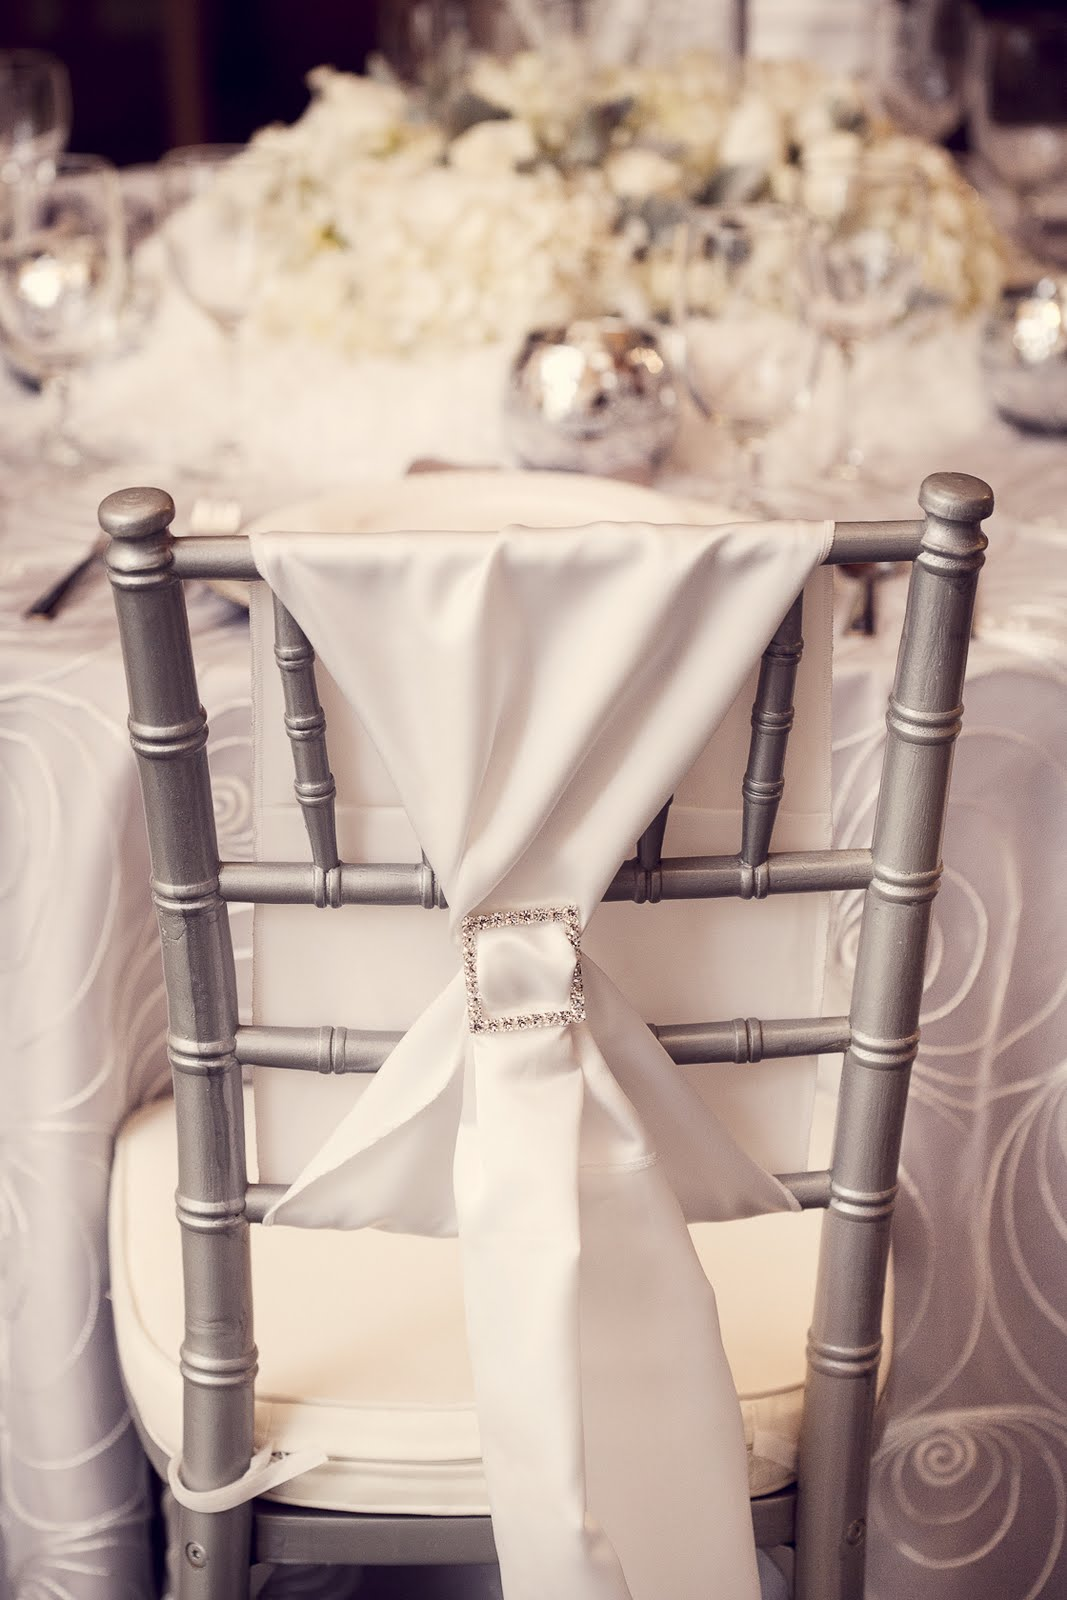 chair covers for plastic chairs weddings fabric club uk arkansas bride magazine feature junkerman jones